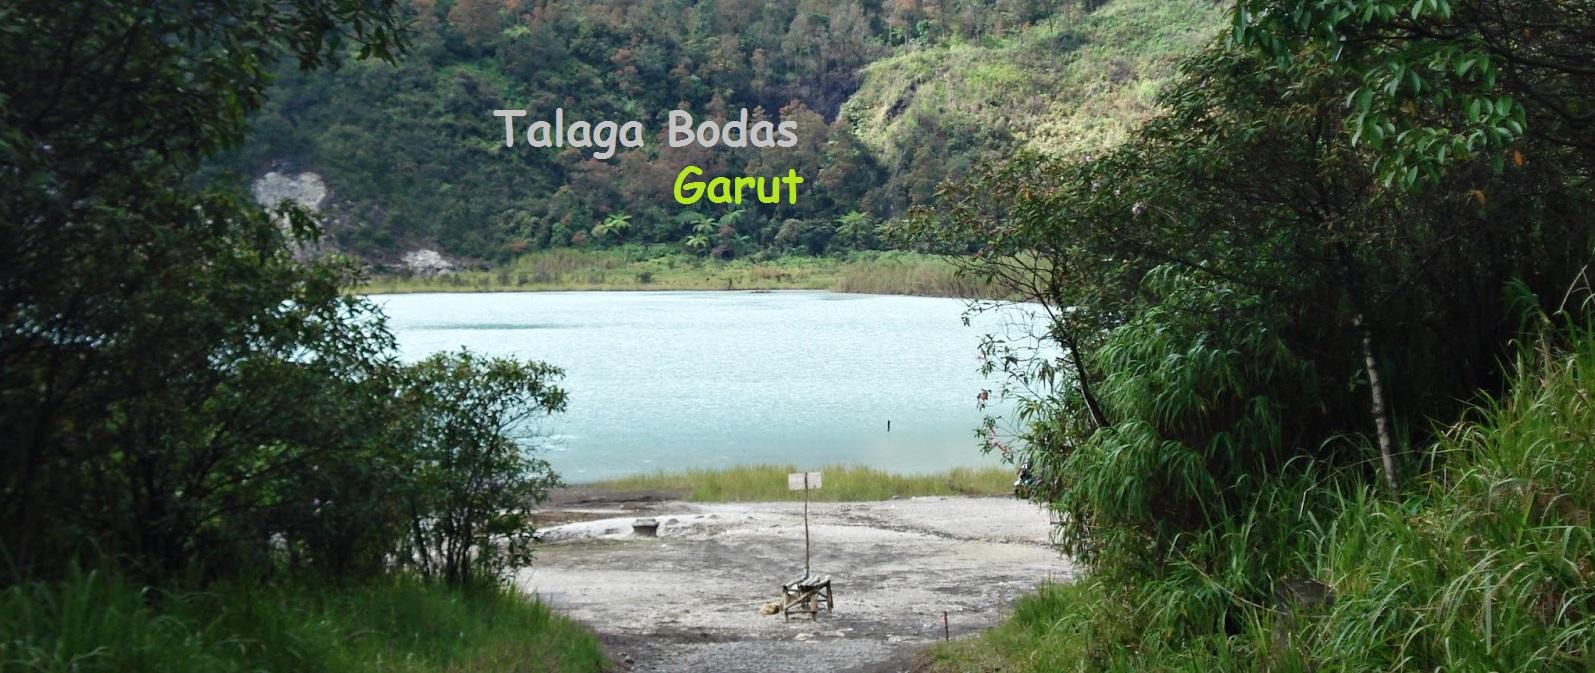 Rute Menuju Wisata Talaga Bodas Garut Jawa Barat Oh Gunung